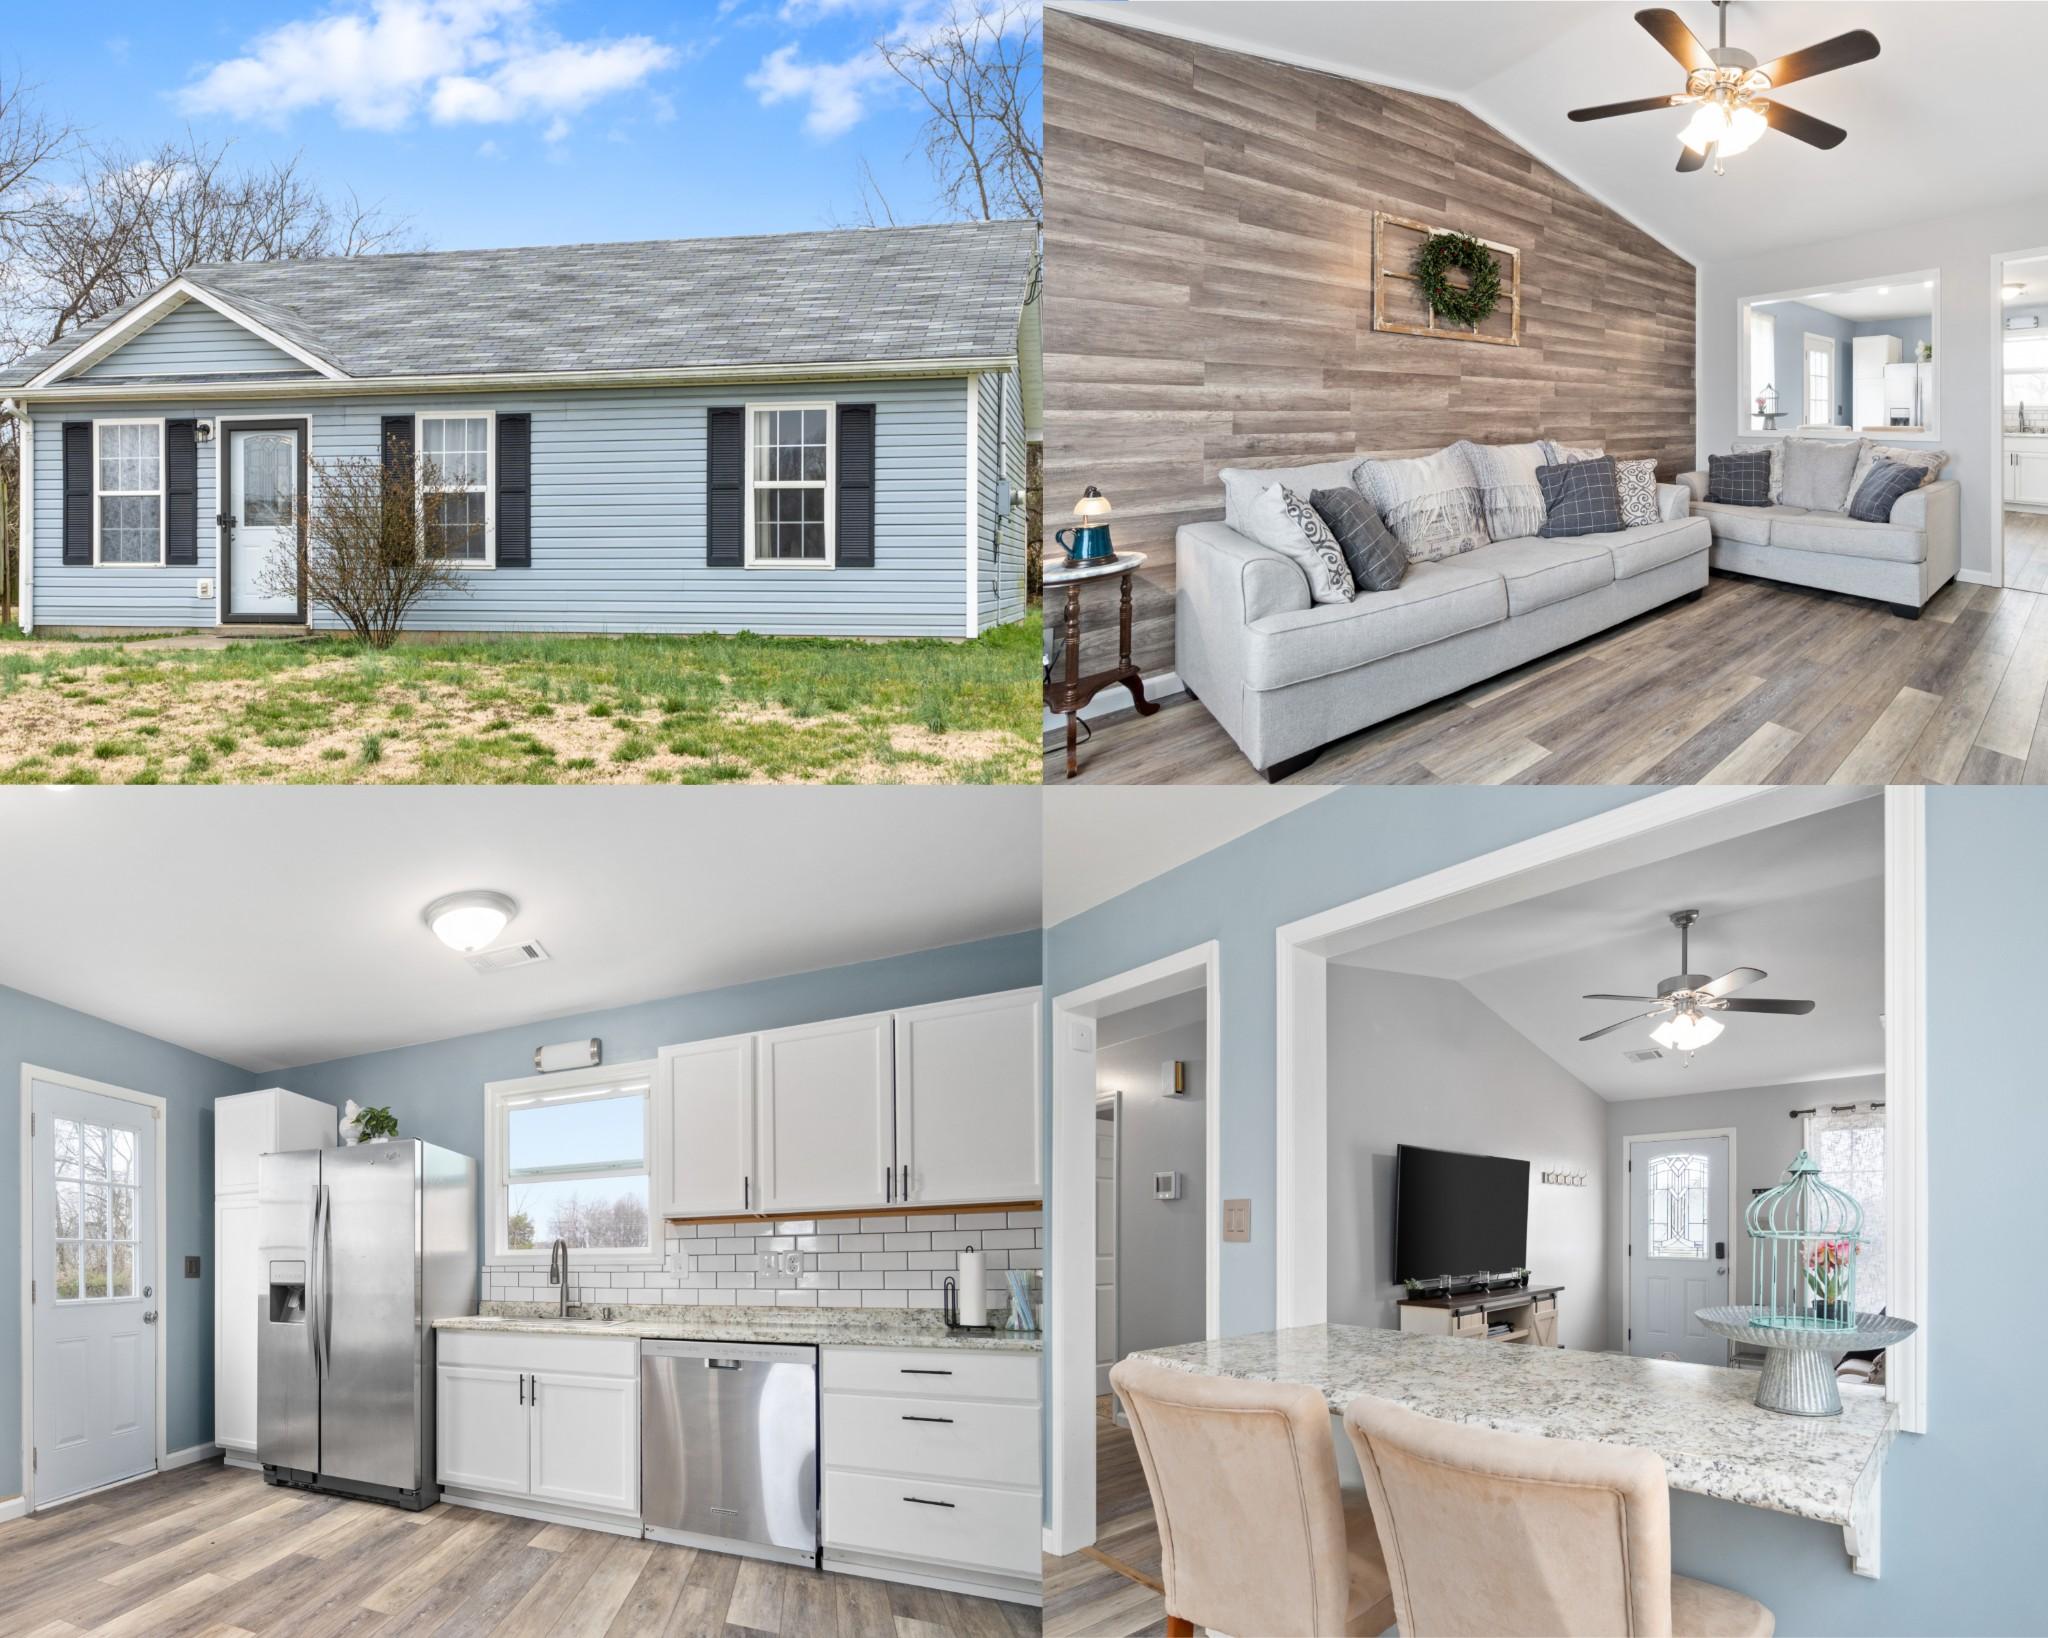 1017 Shadow Ridge Ave, Oak Grove, KY 42262 - Oak Grove, KY real estate listing